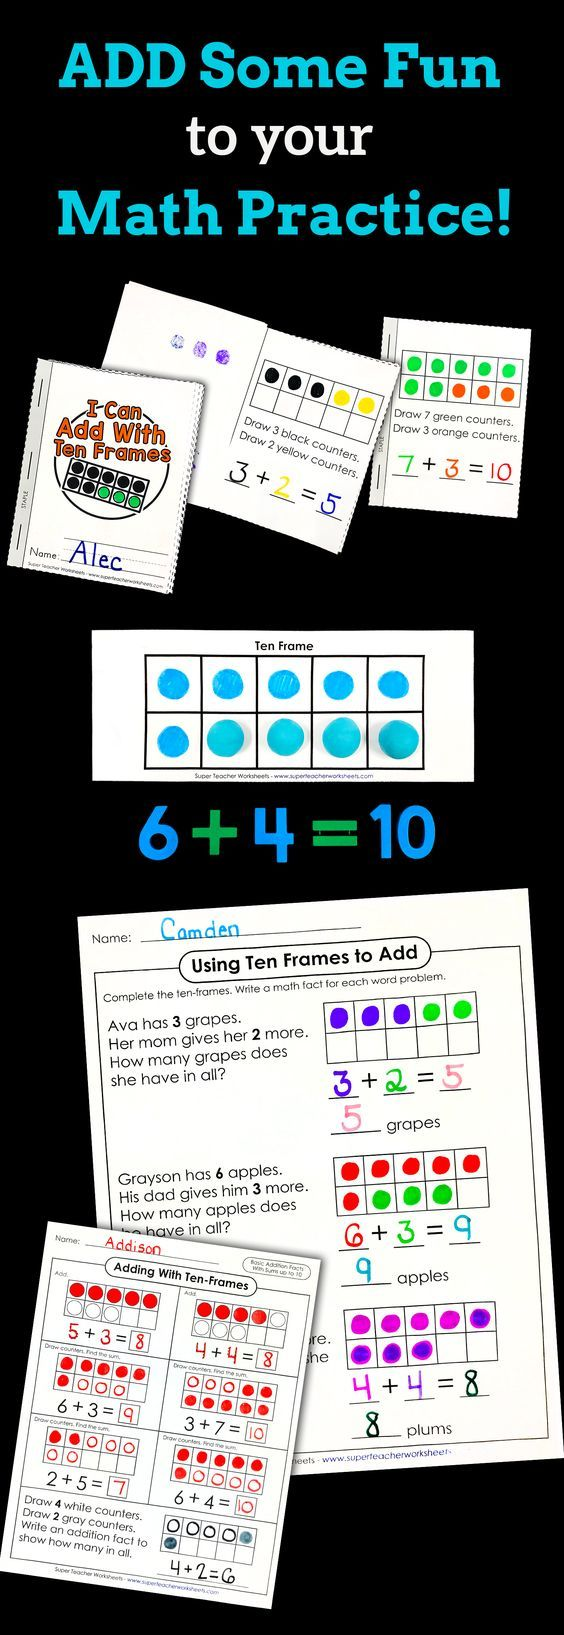 Pin By Aathira Rajeev On Maths Grade 1 Basic Addition Worksheets Super Teacher Worksheets Addition Worksheets